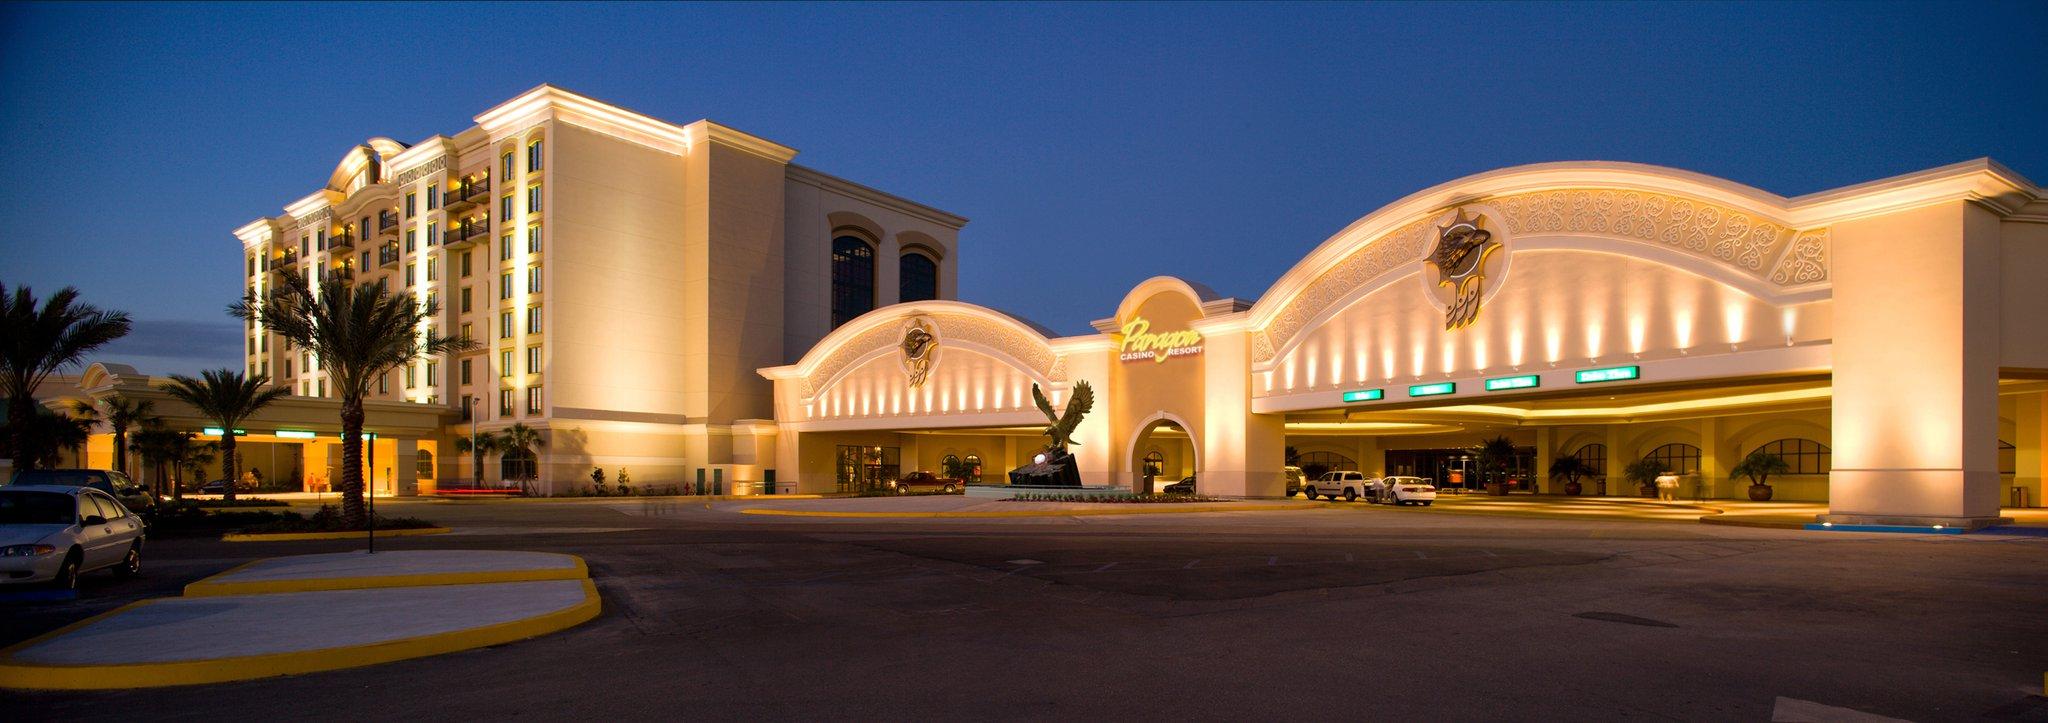 Marksville louisiana casinos mgm casino hotel